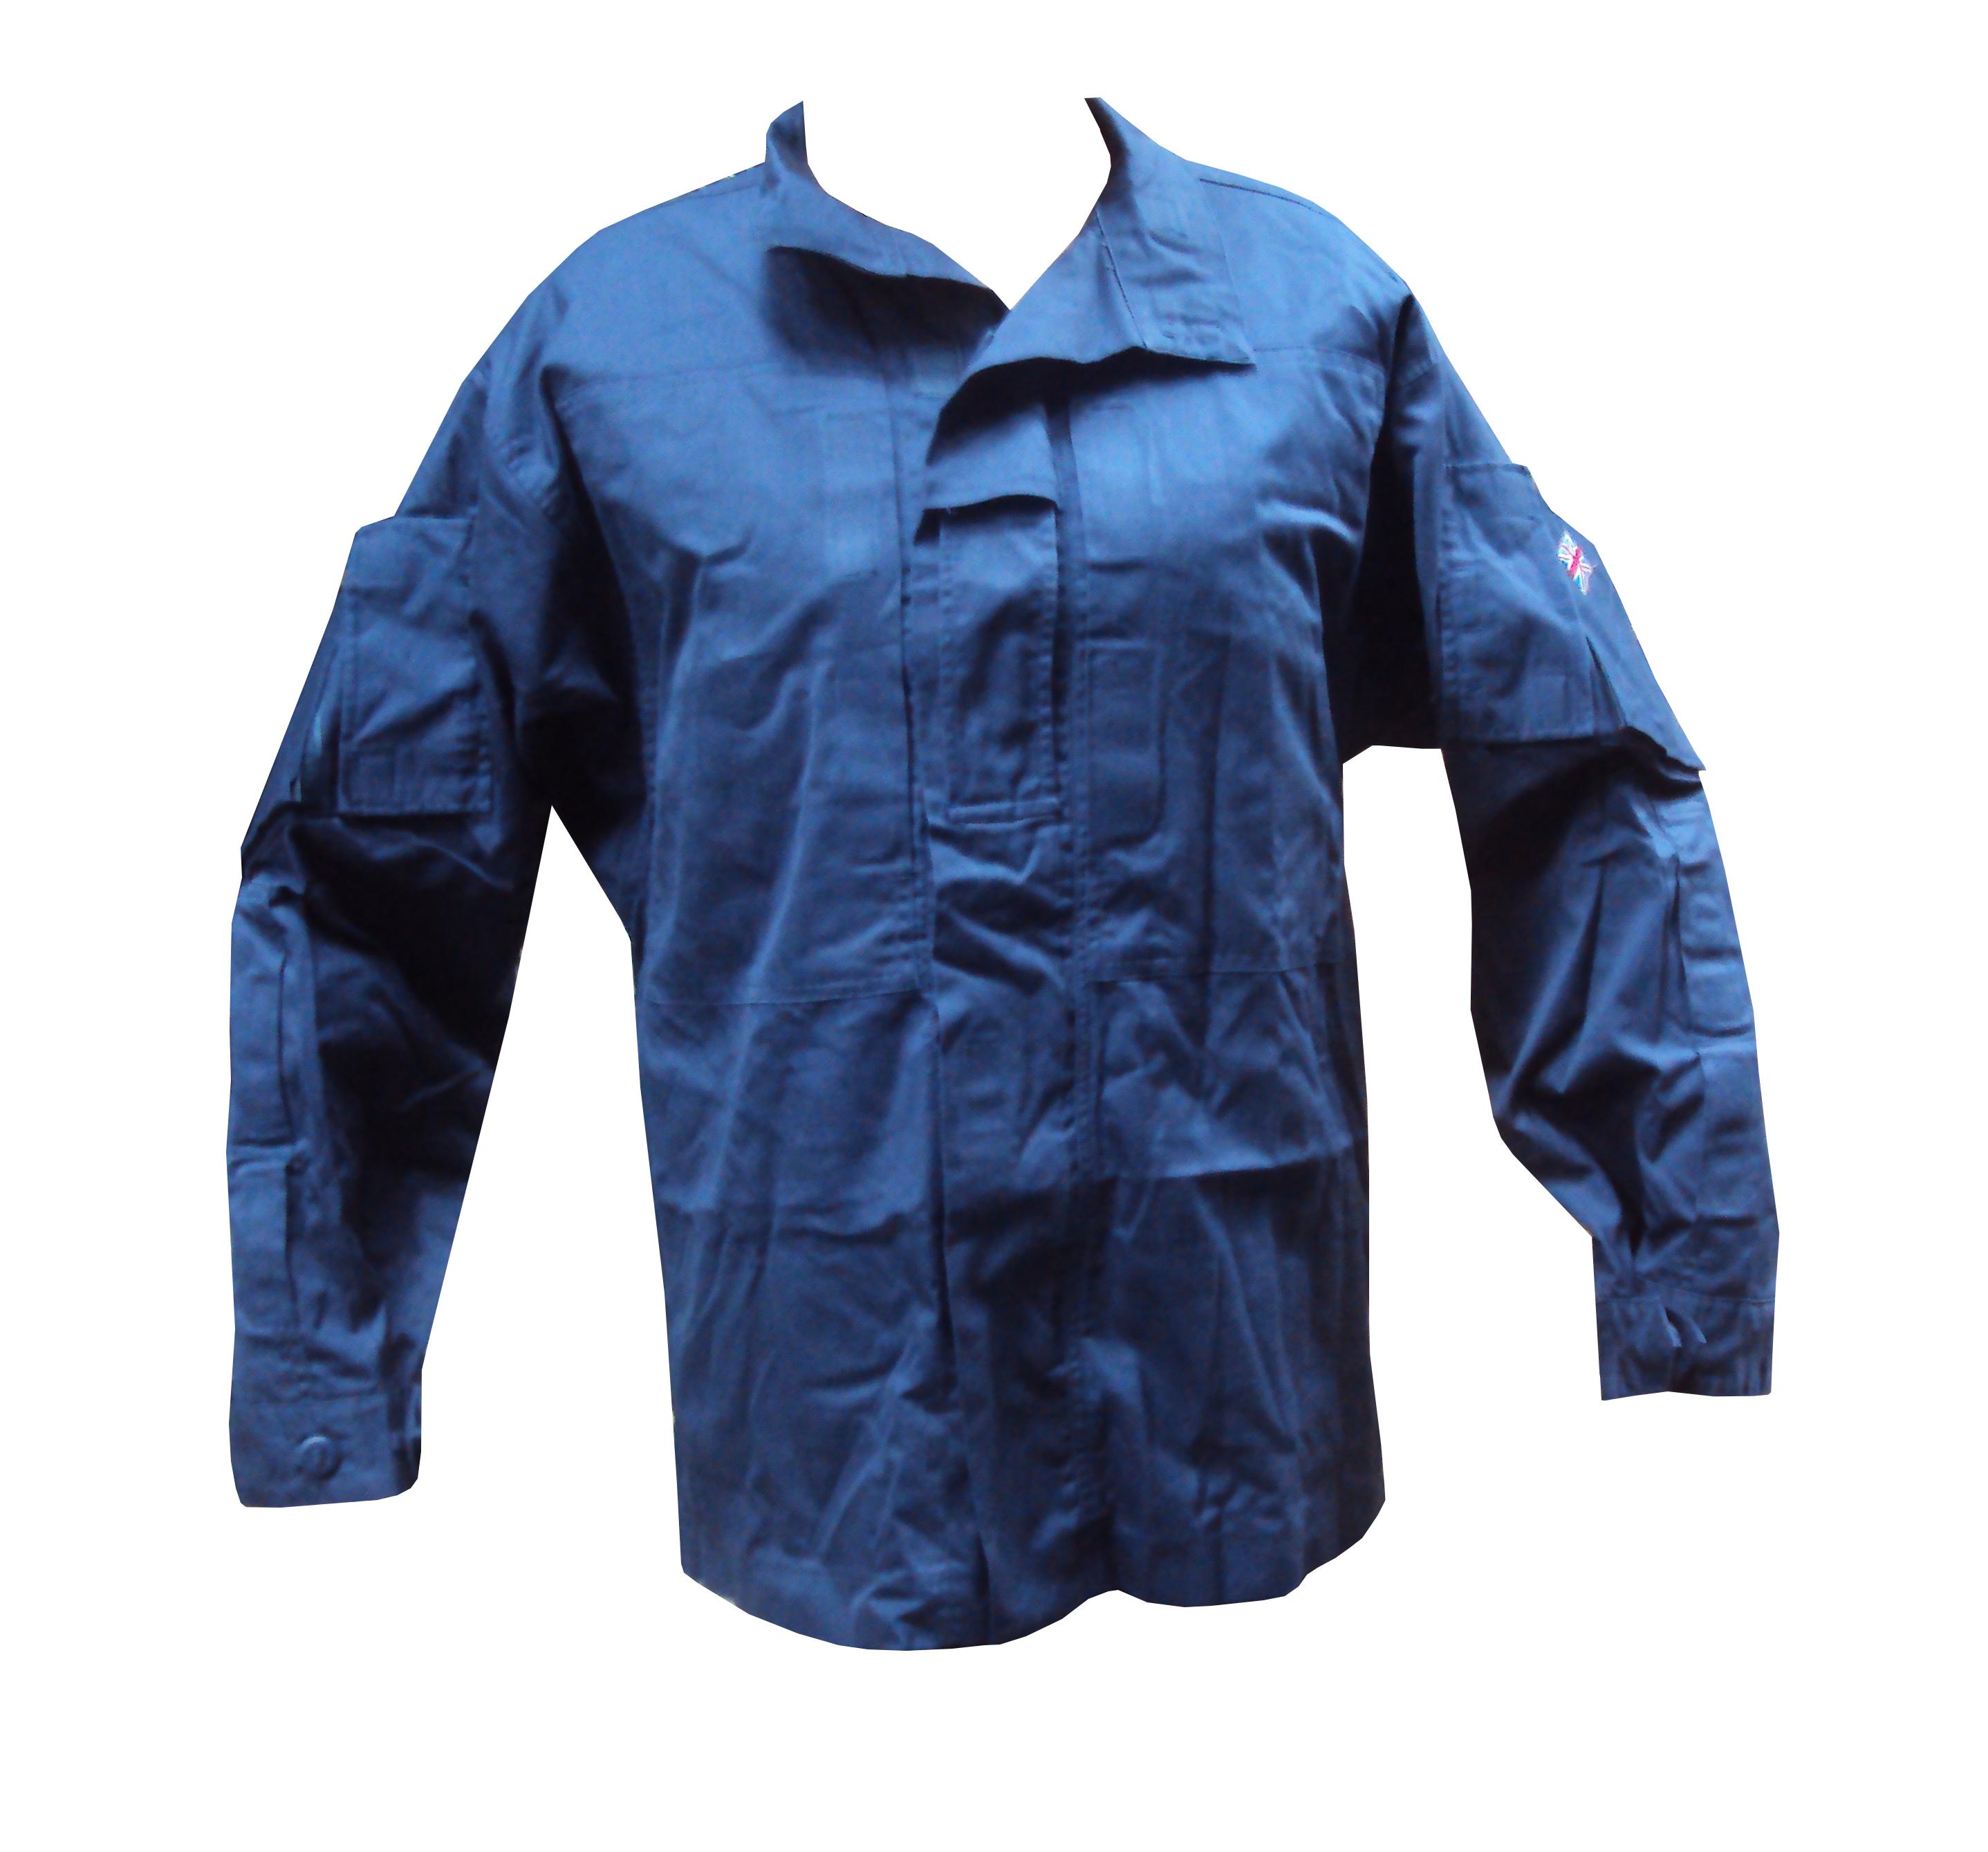 Lot 5 - Pack of 10 - Blue Shirts - Grade 1